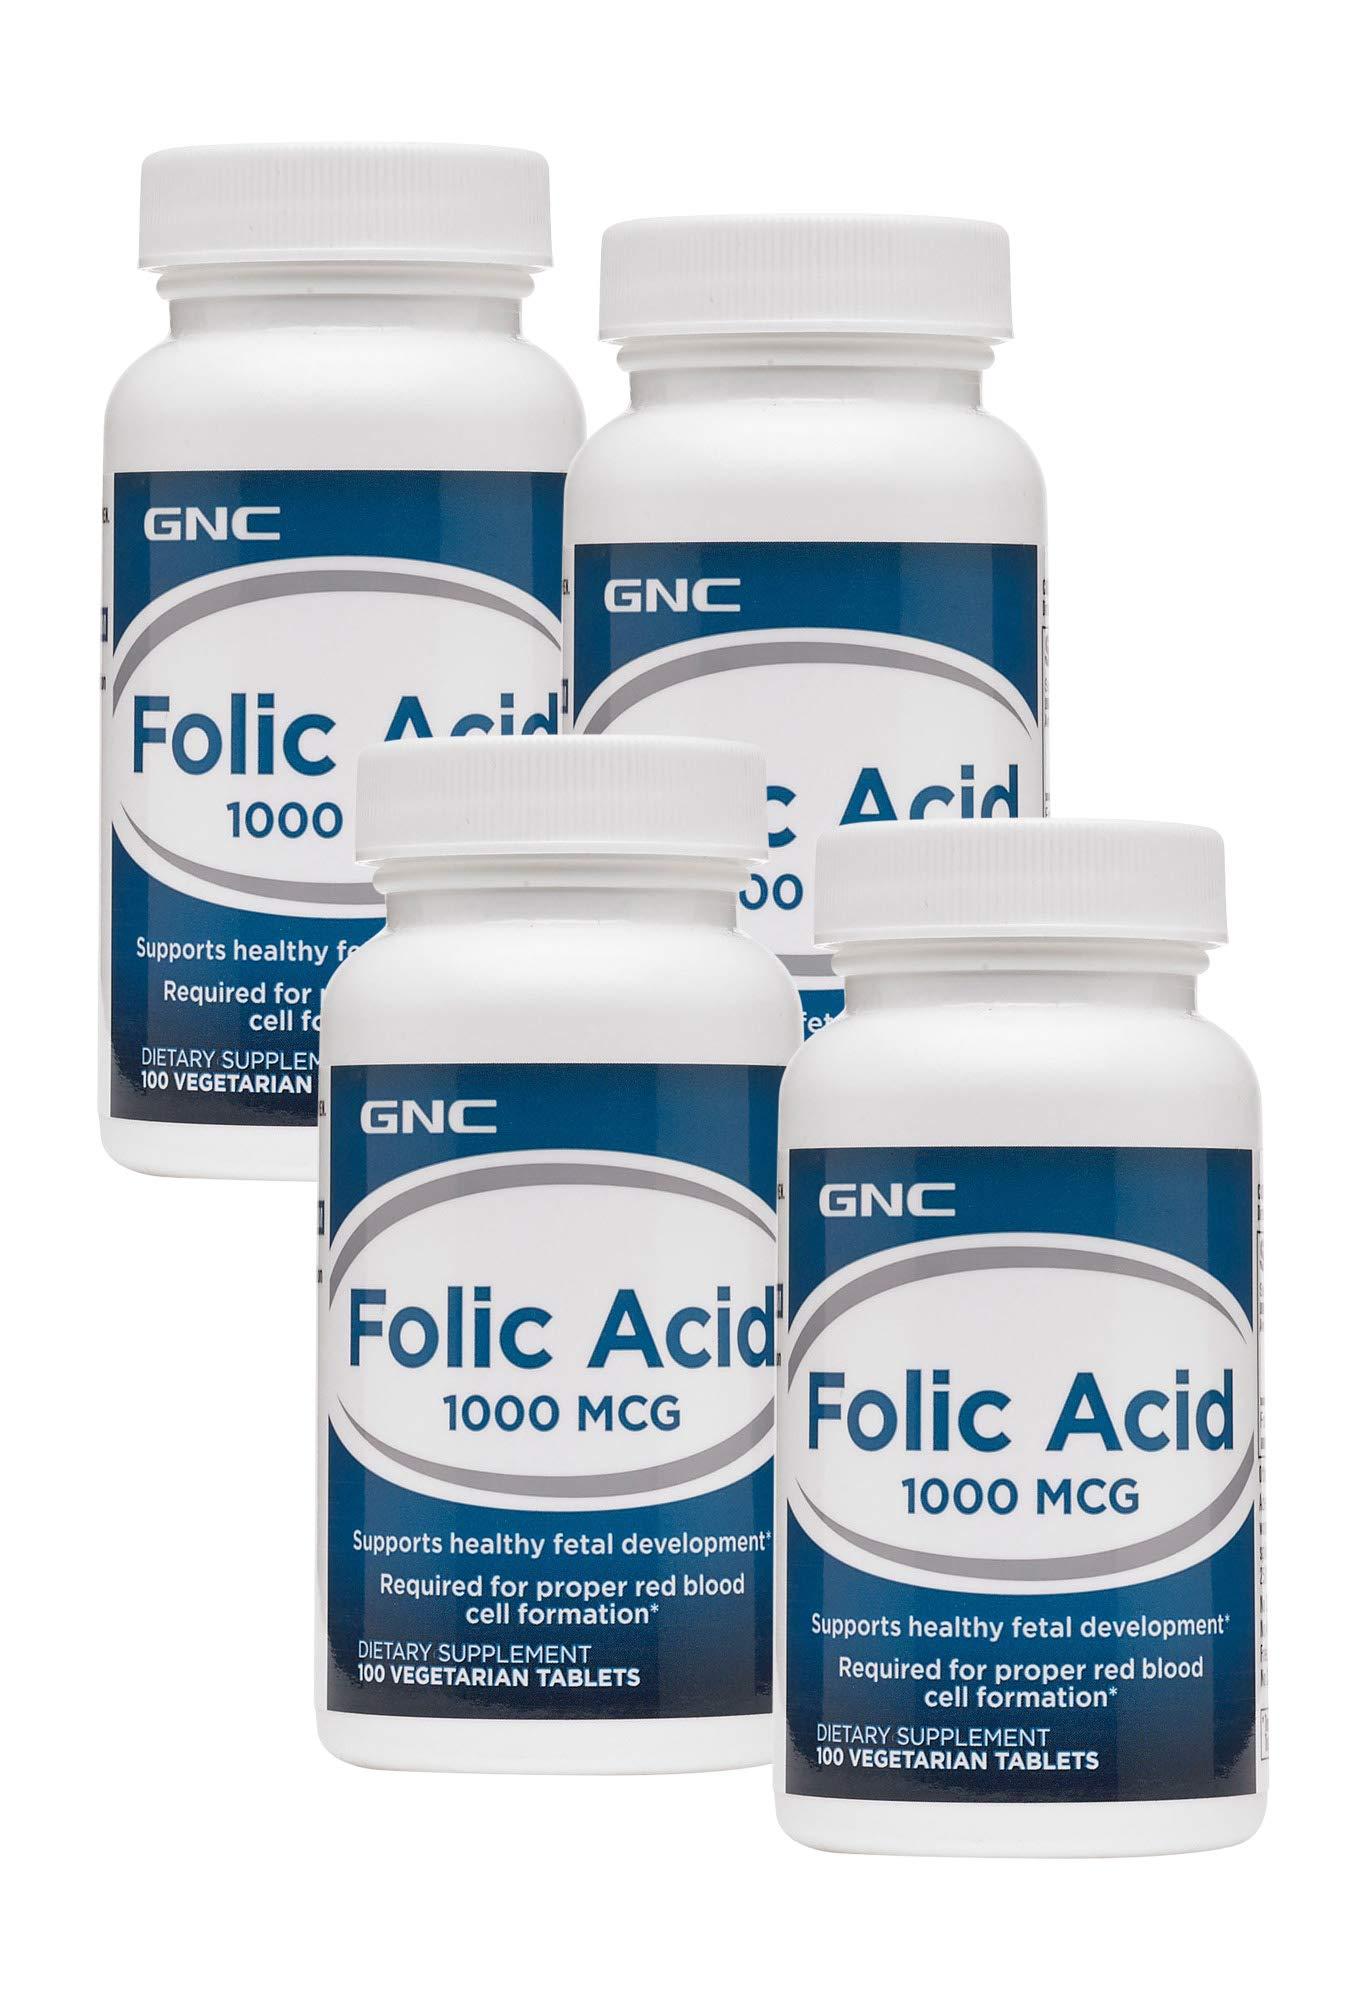 GNC Folic Acid 1000 MCG - 4 Pack